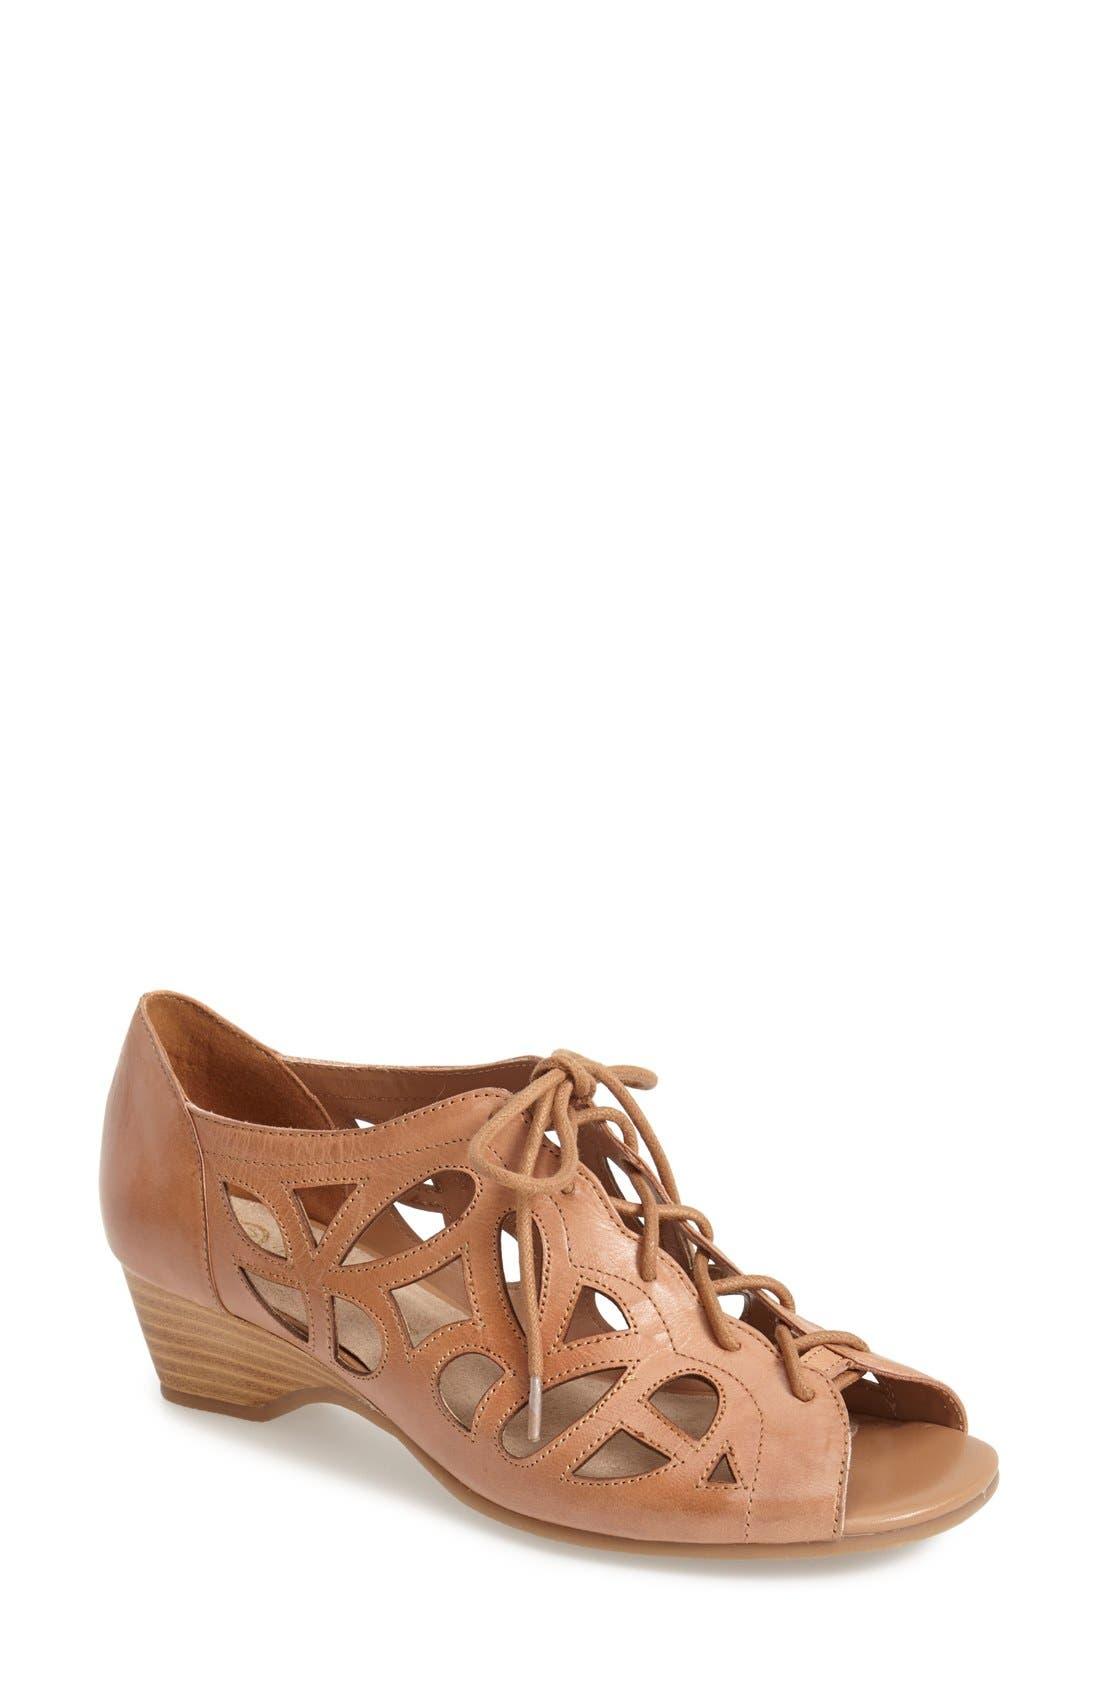 Alternate Image 1 Selected - Bella Vita 'Pixie' Lace Up Cutout Leather Sandal